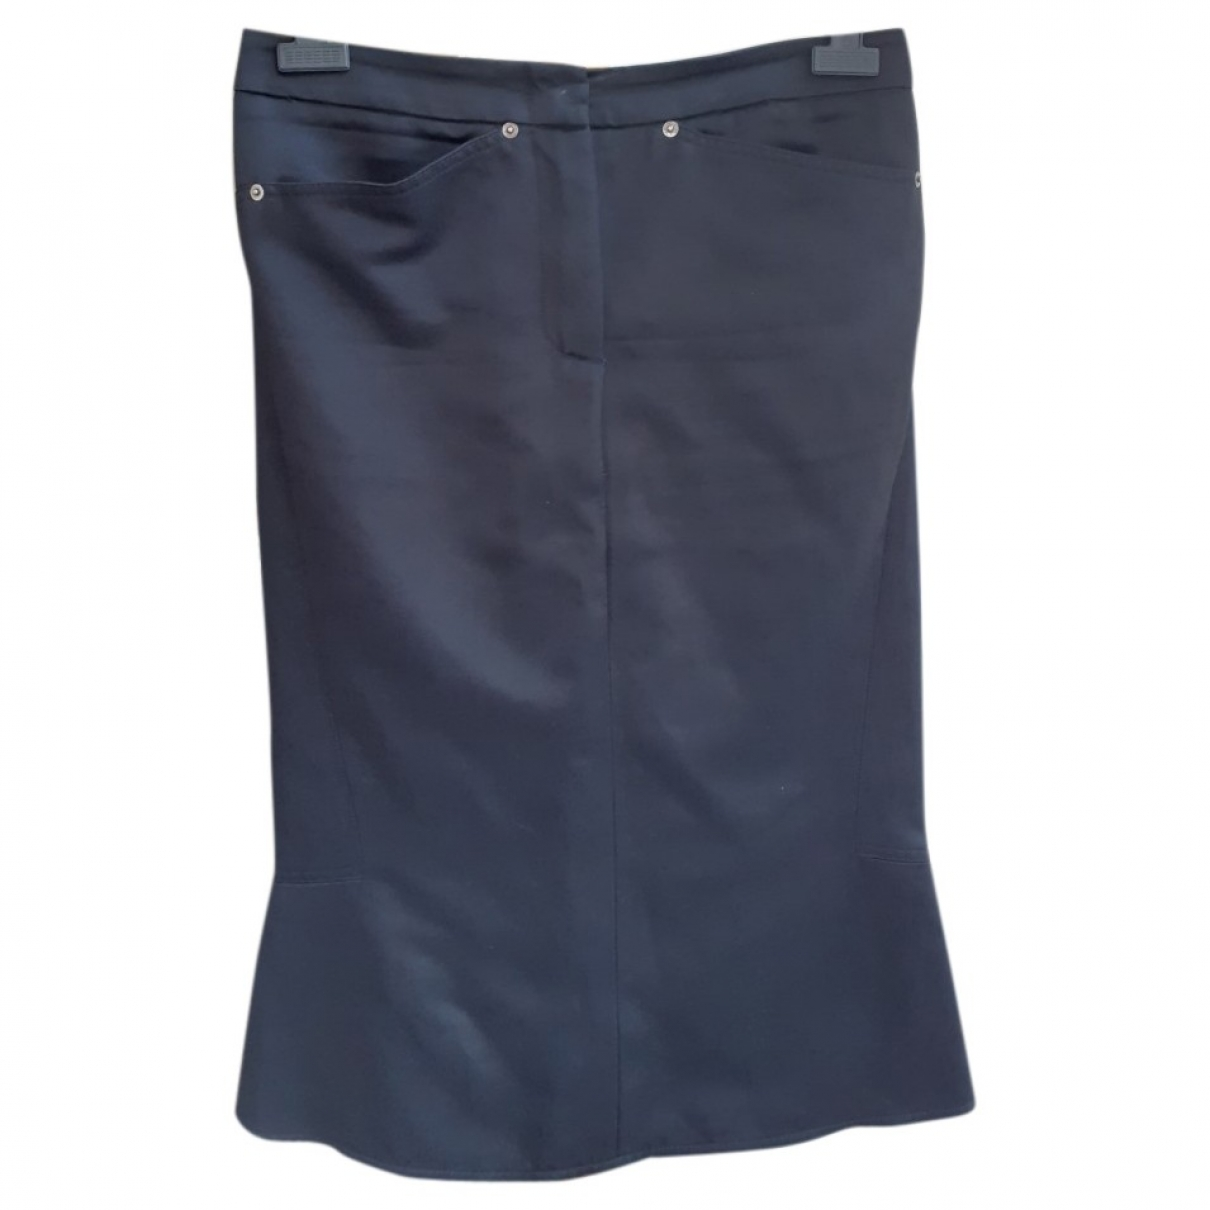 Max Mara \N Blue Cotton skirt for Women 42 IT